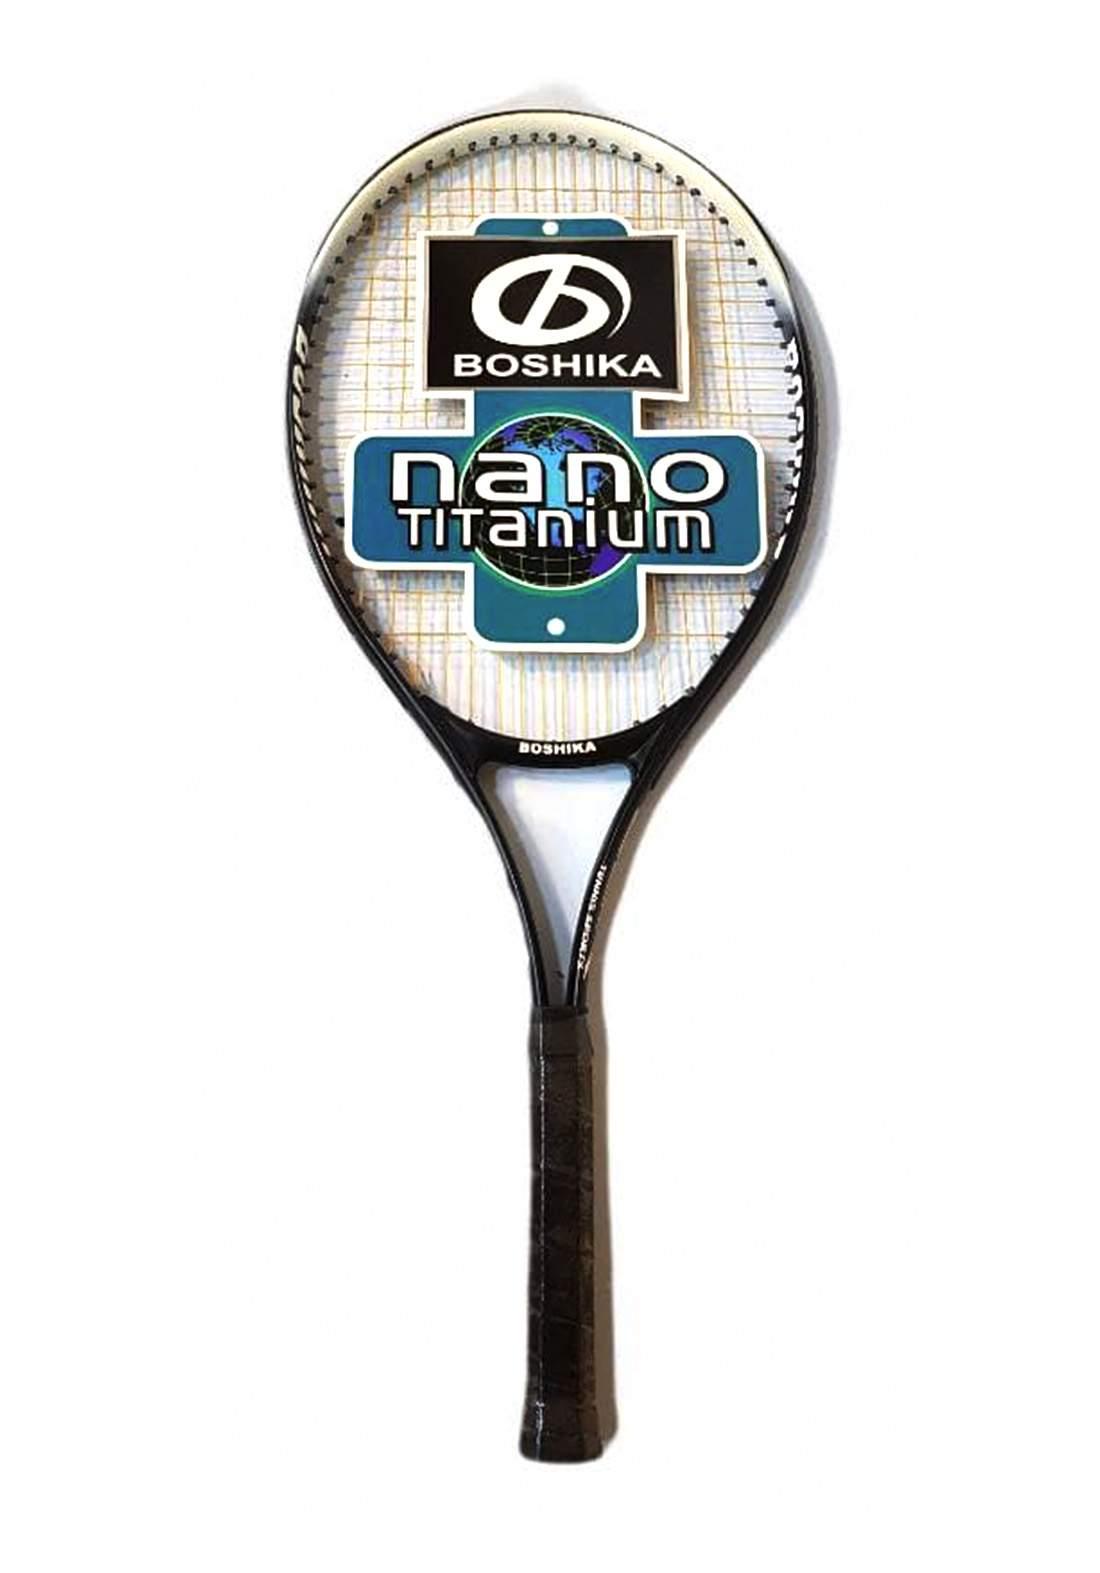 Nano Titanium Tennis Racket مضرب تنس مفرد